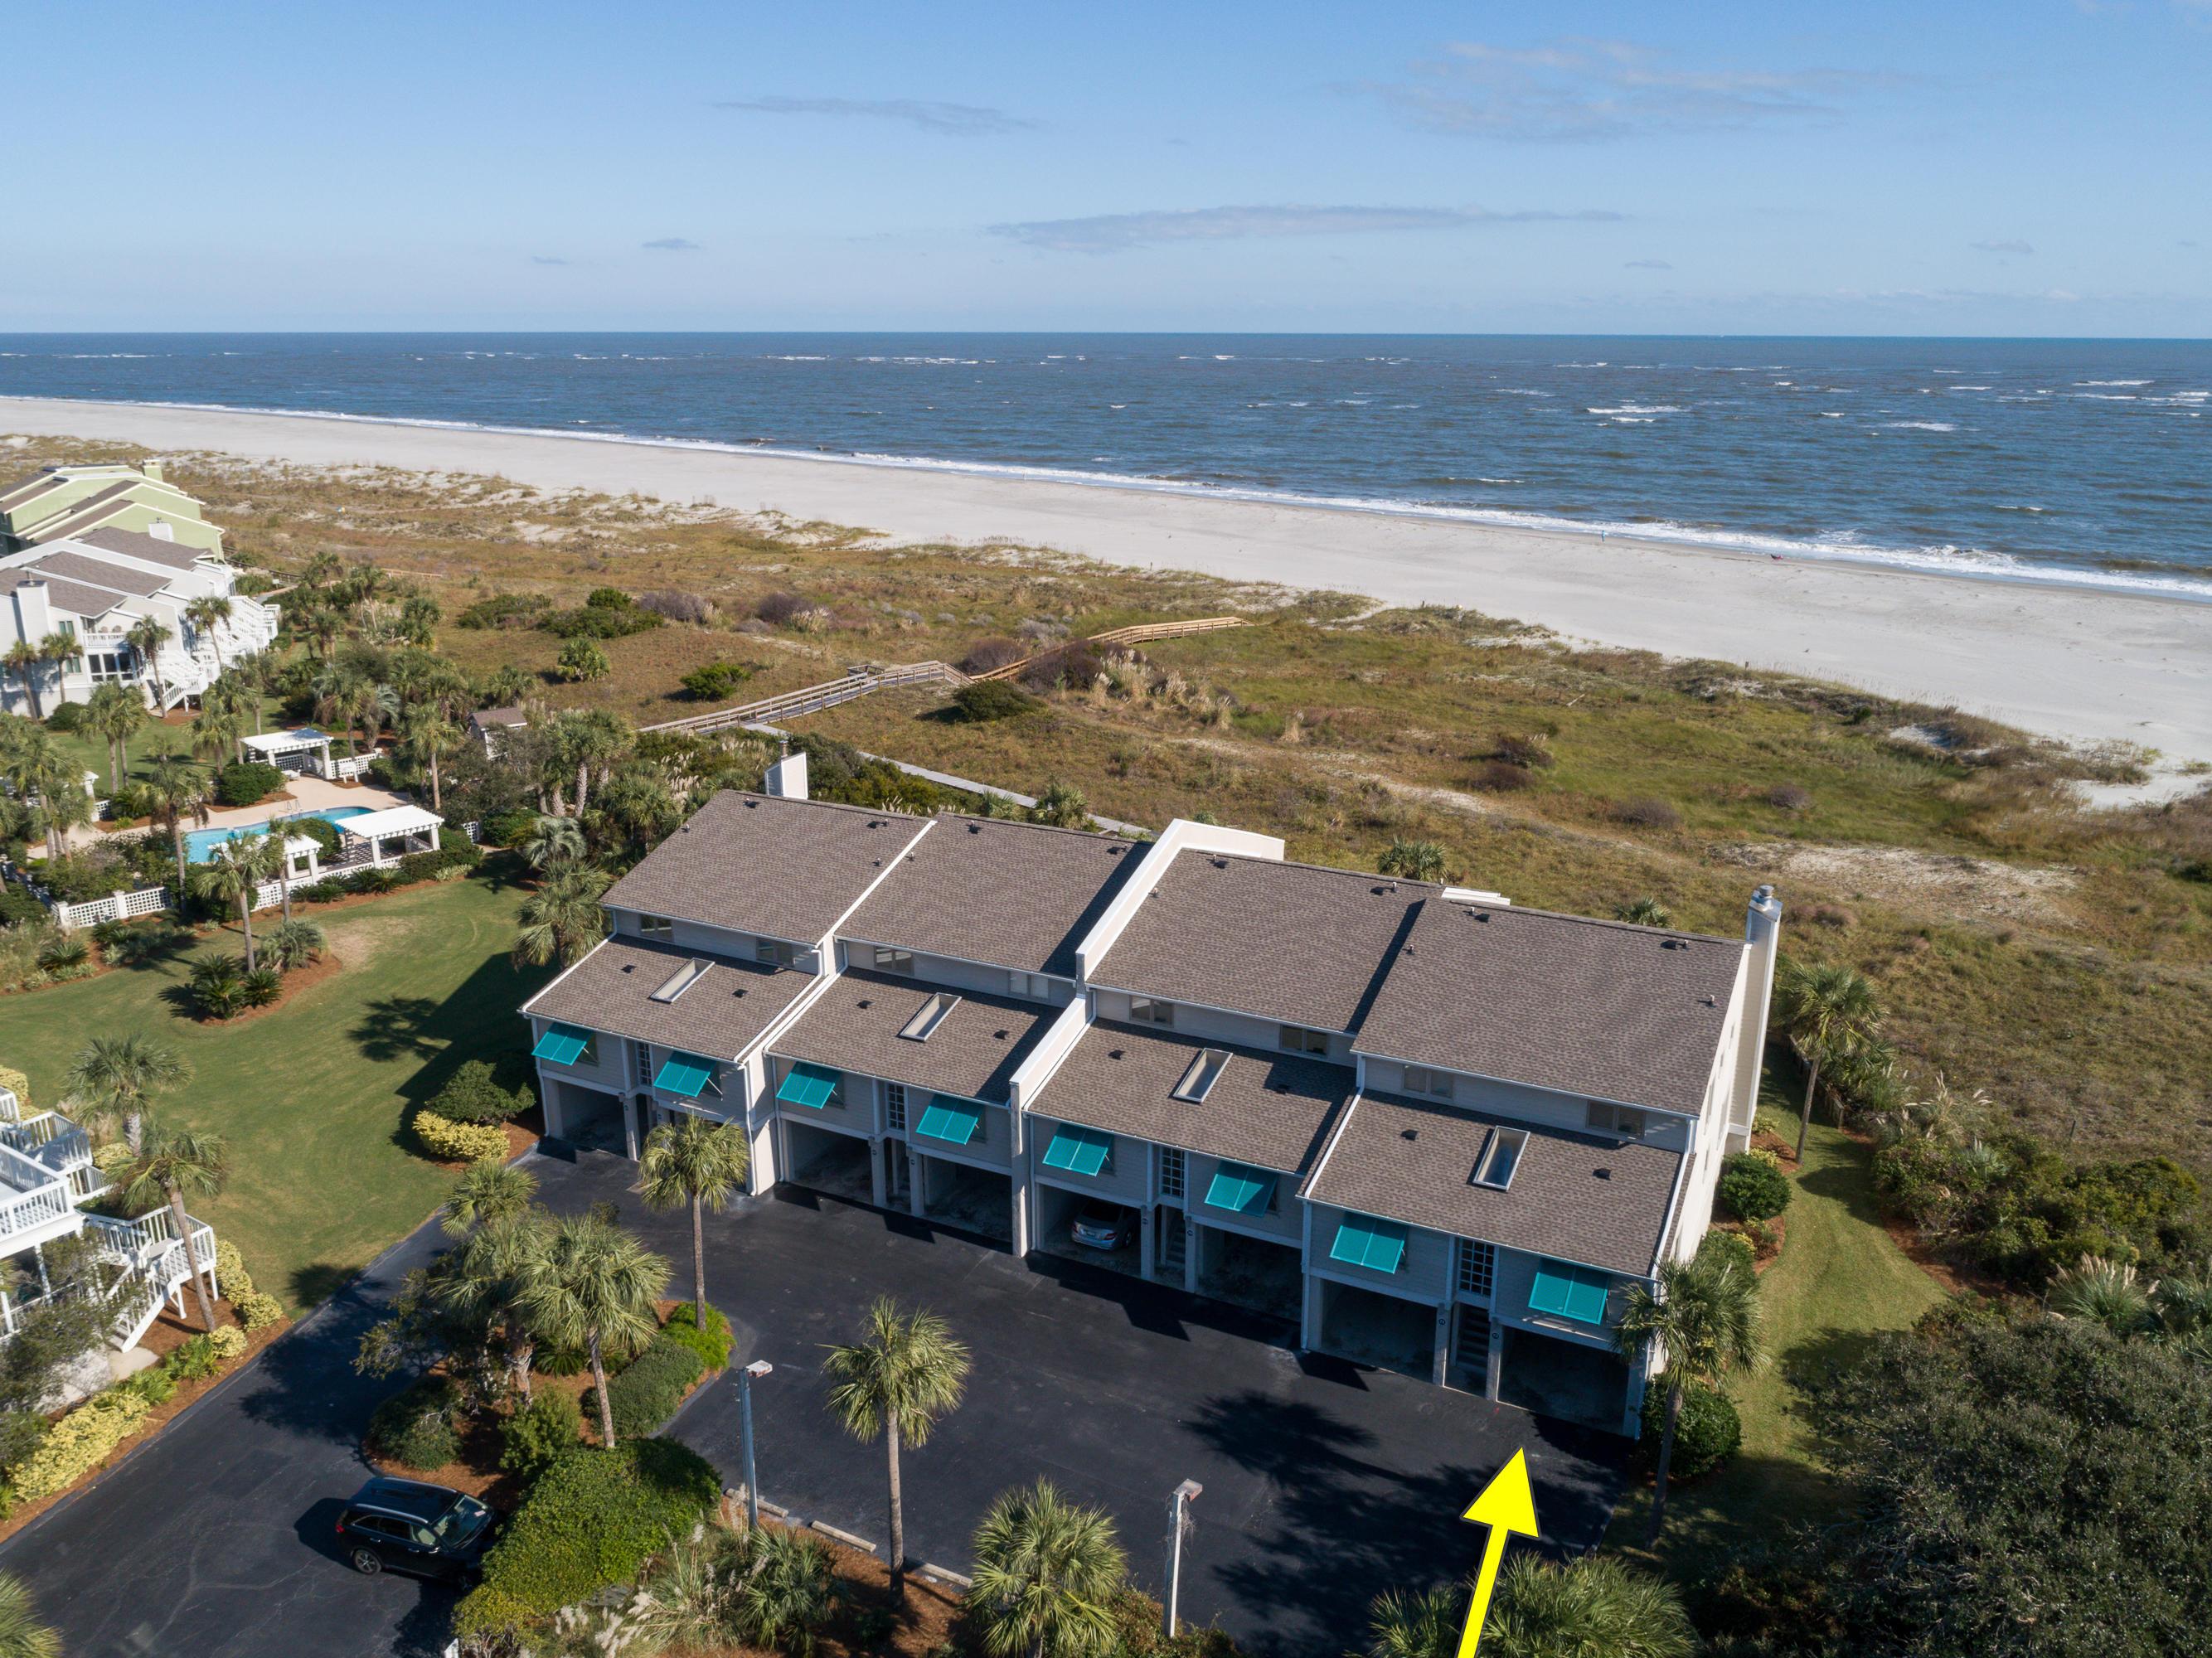 72 Beach Club Villas Isle Of Palms, SC 29451